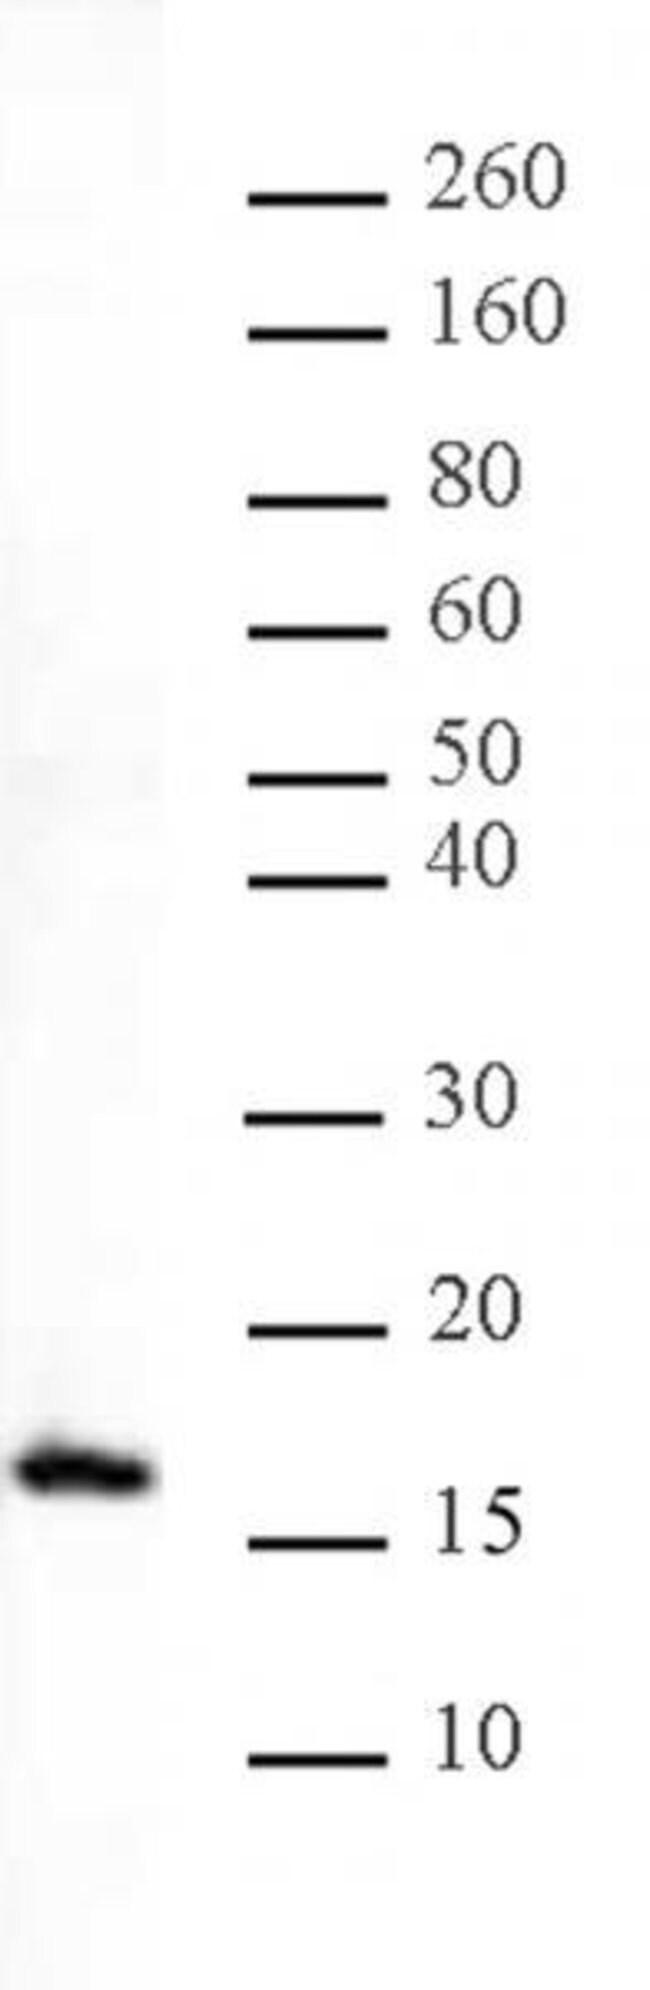 Histone H3K27me1 Rabbit anti-Human, Unconjugated, Polyclonal, Active Motif:Antibodies:Primary